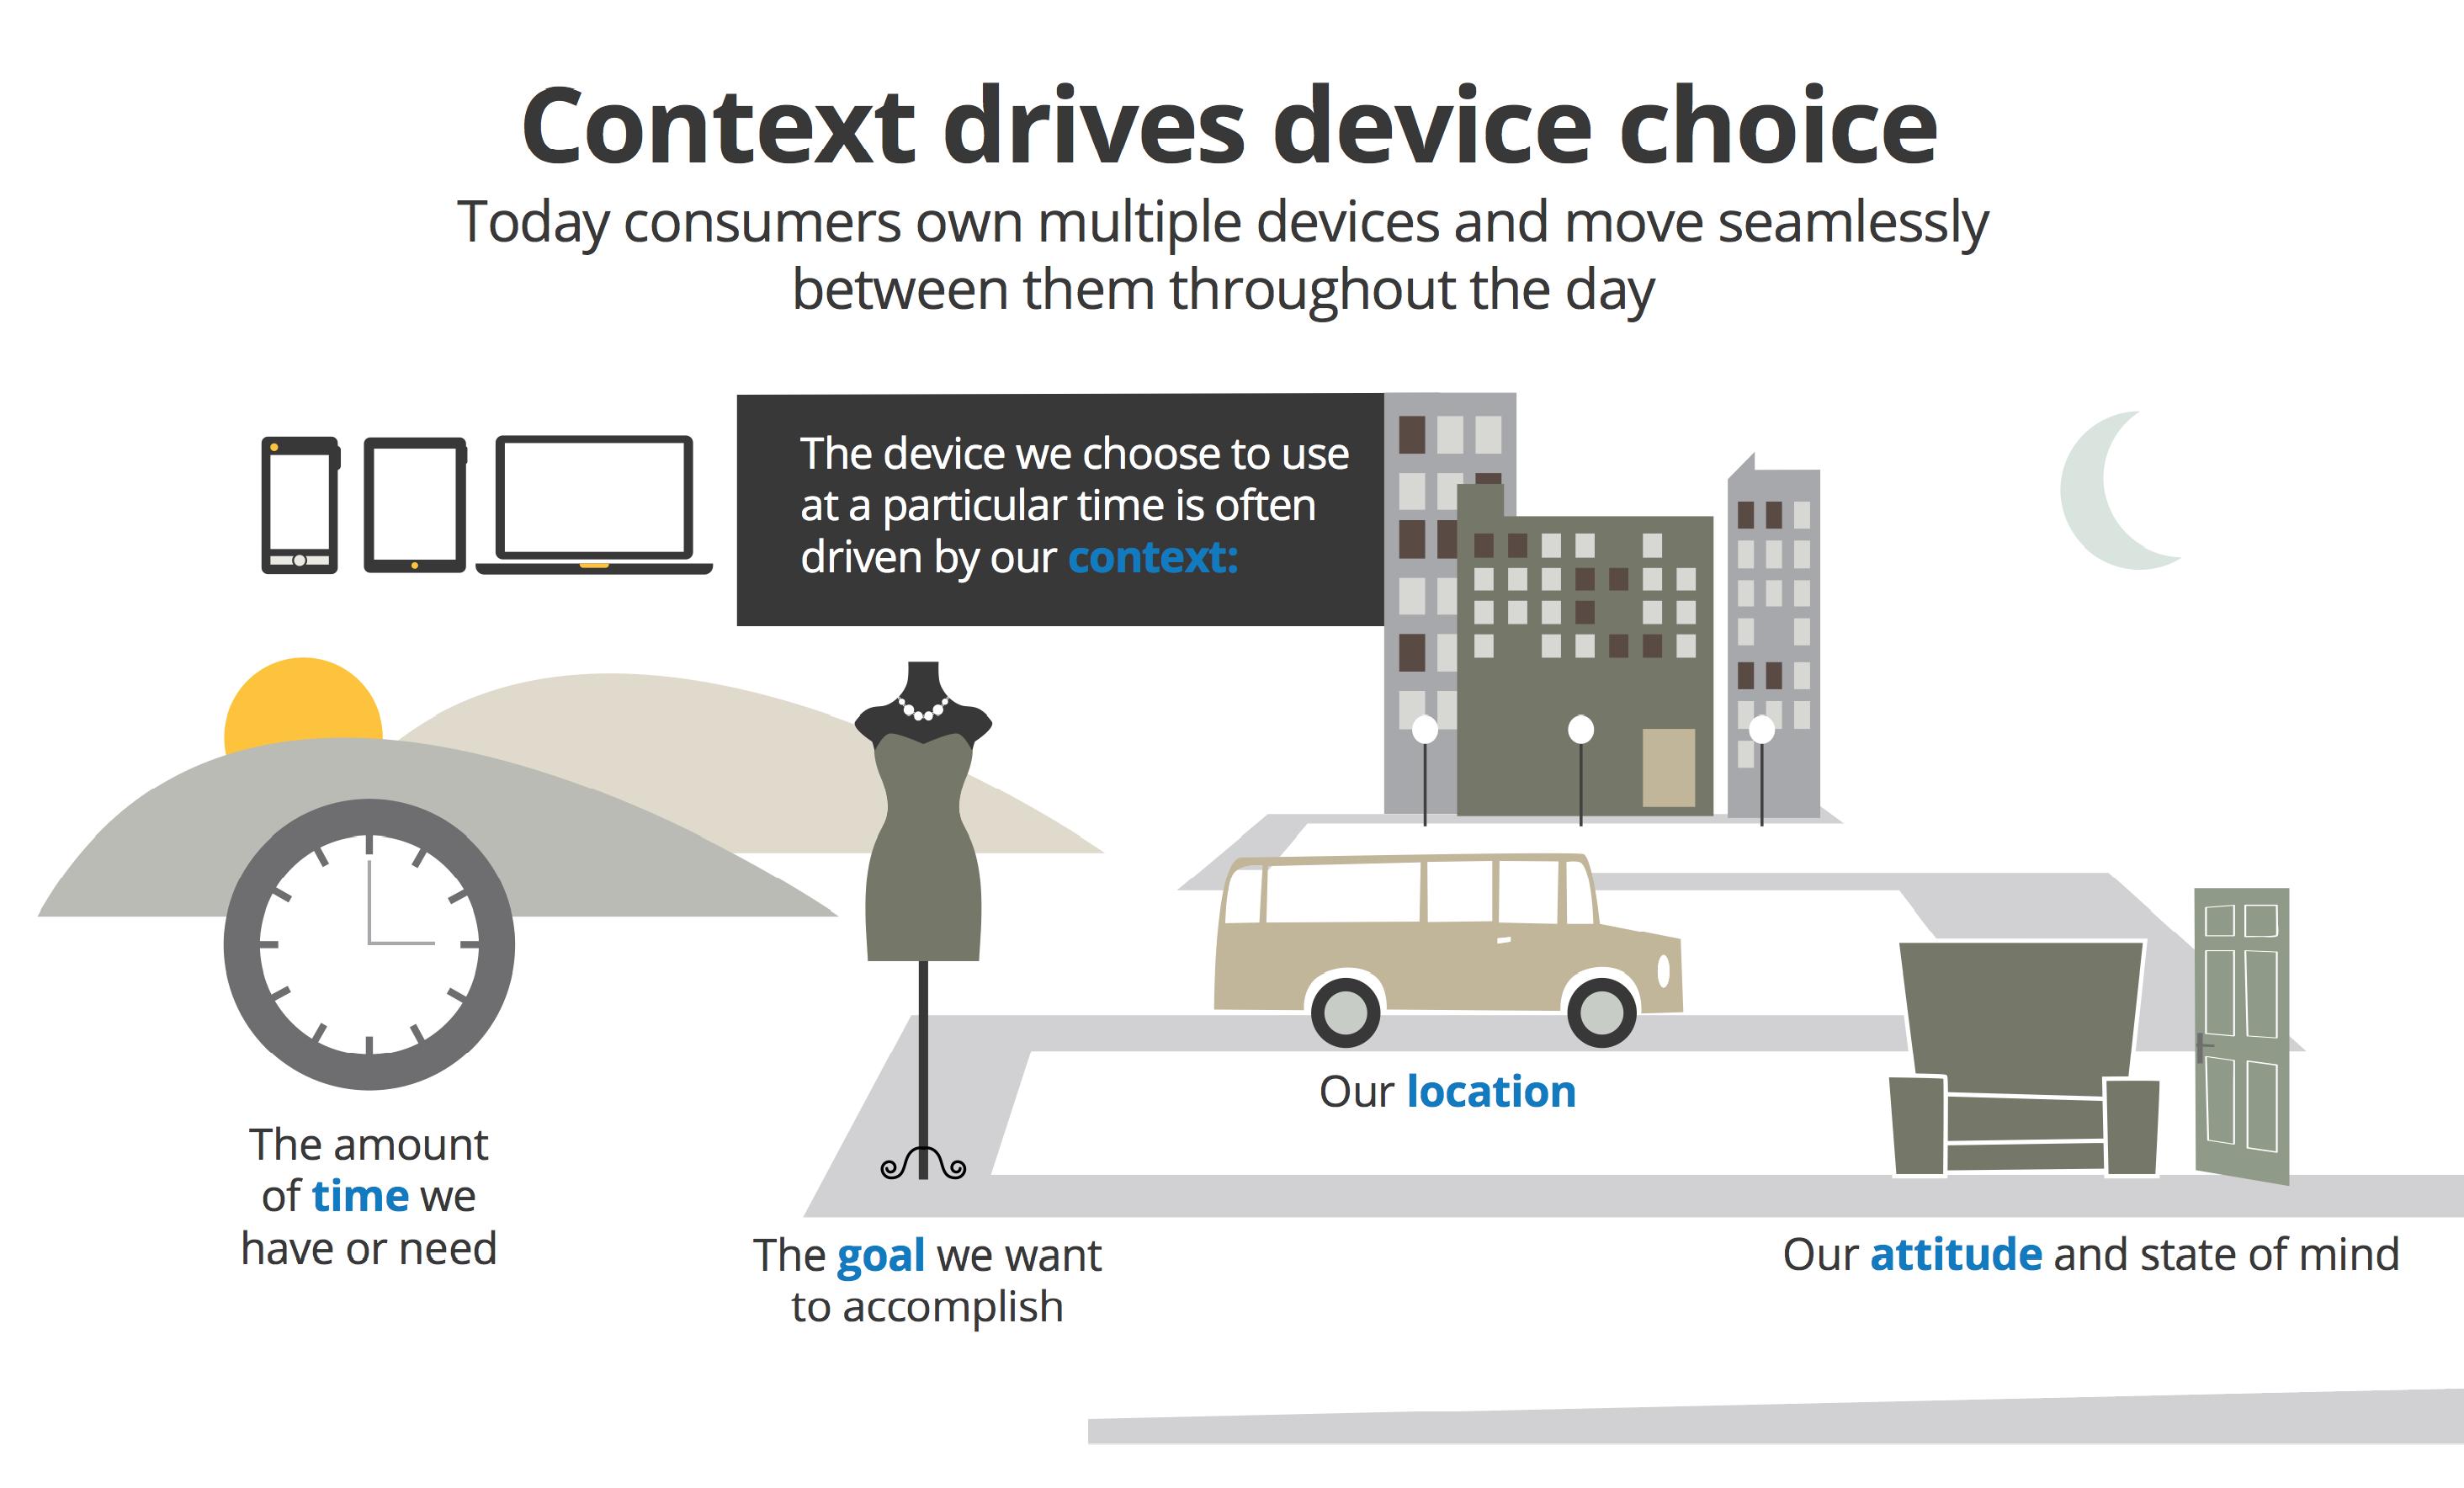 Context drives device choice